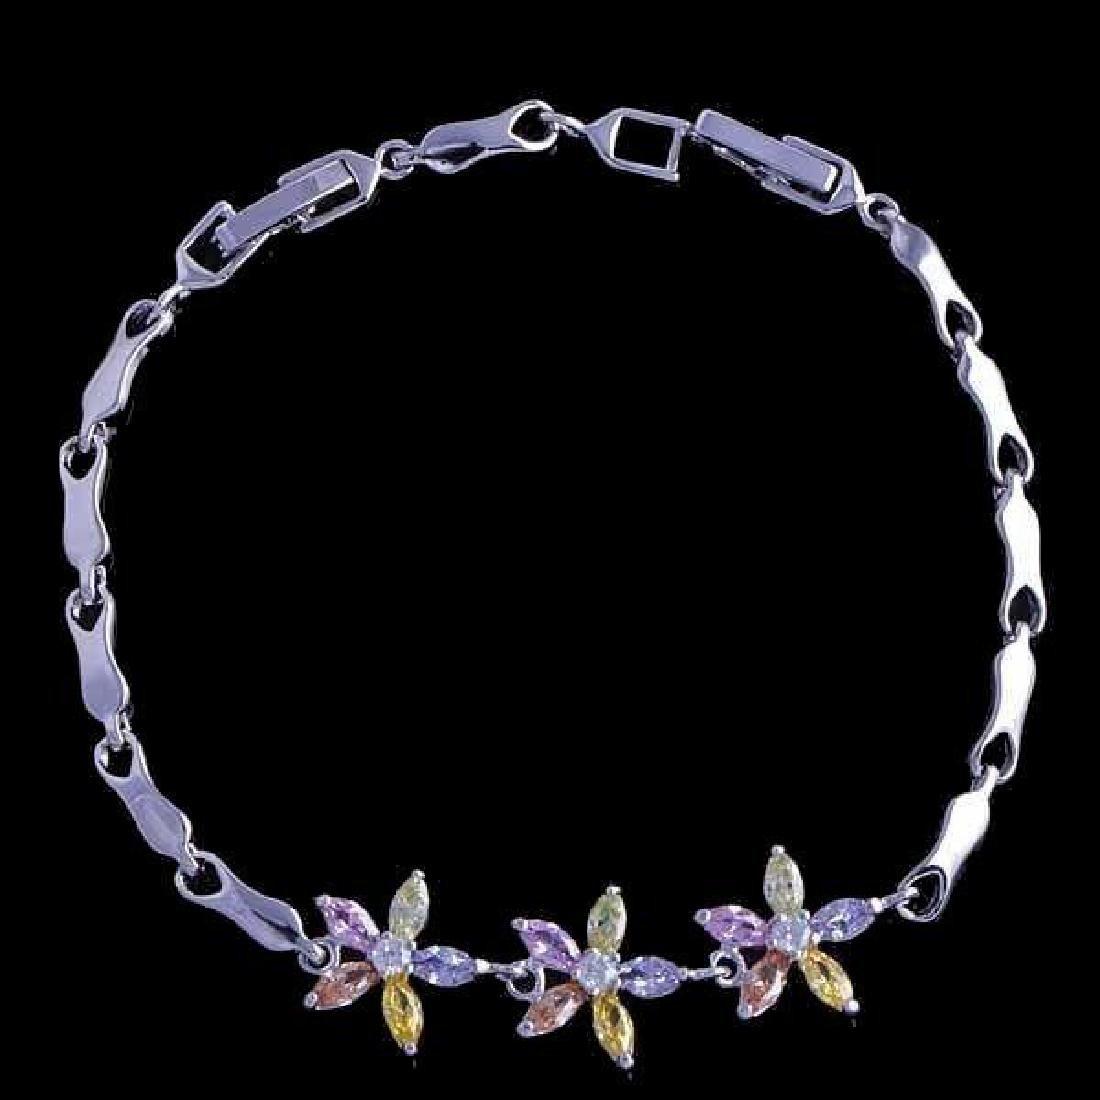 Multi-colored Spring Flower Bracelet